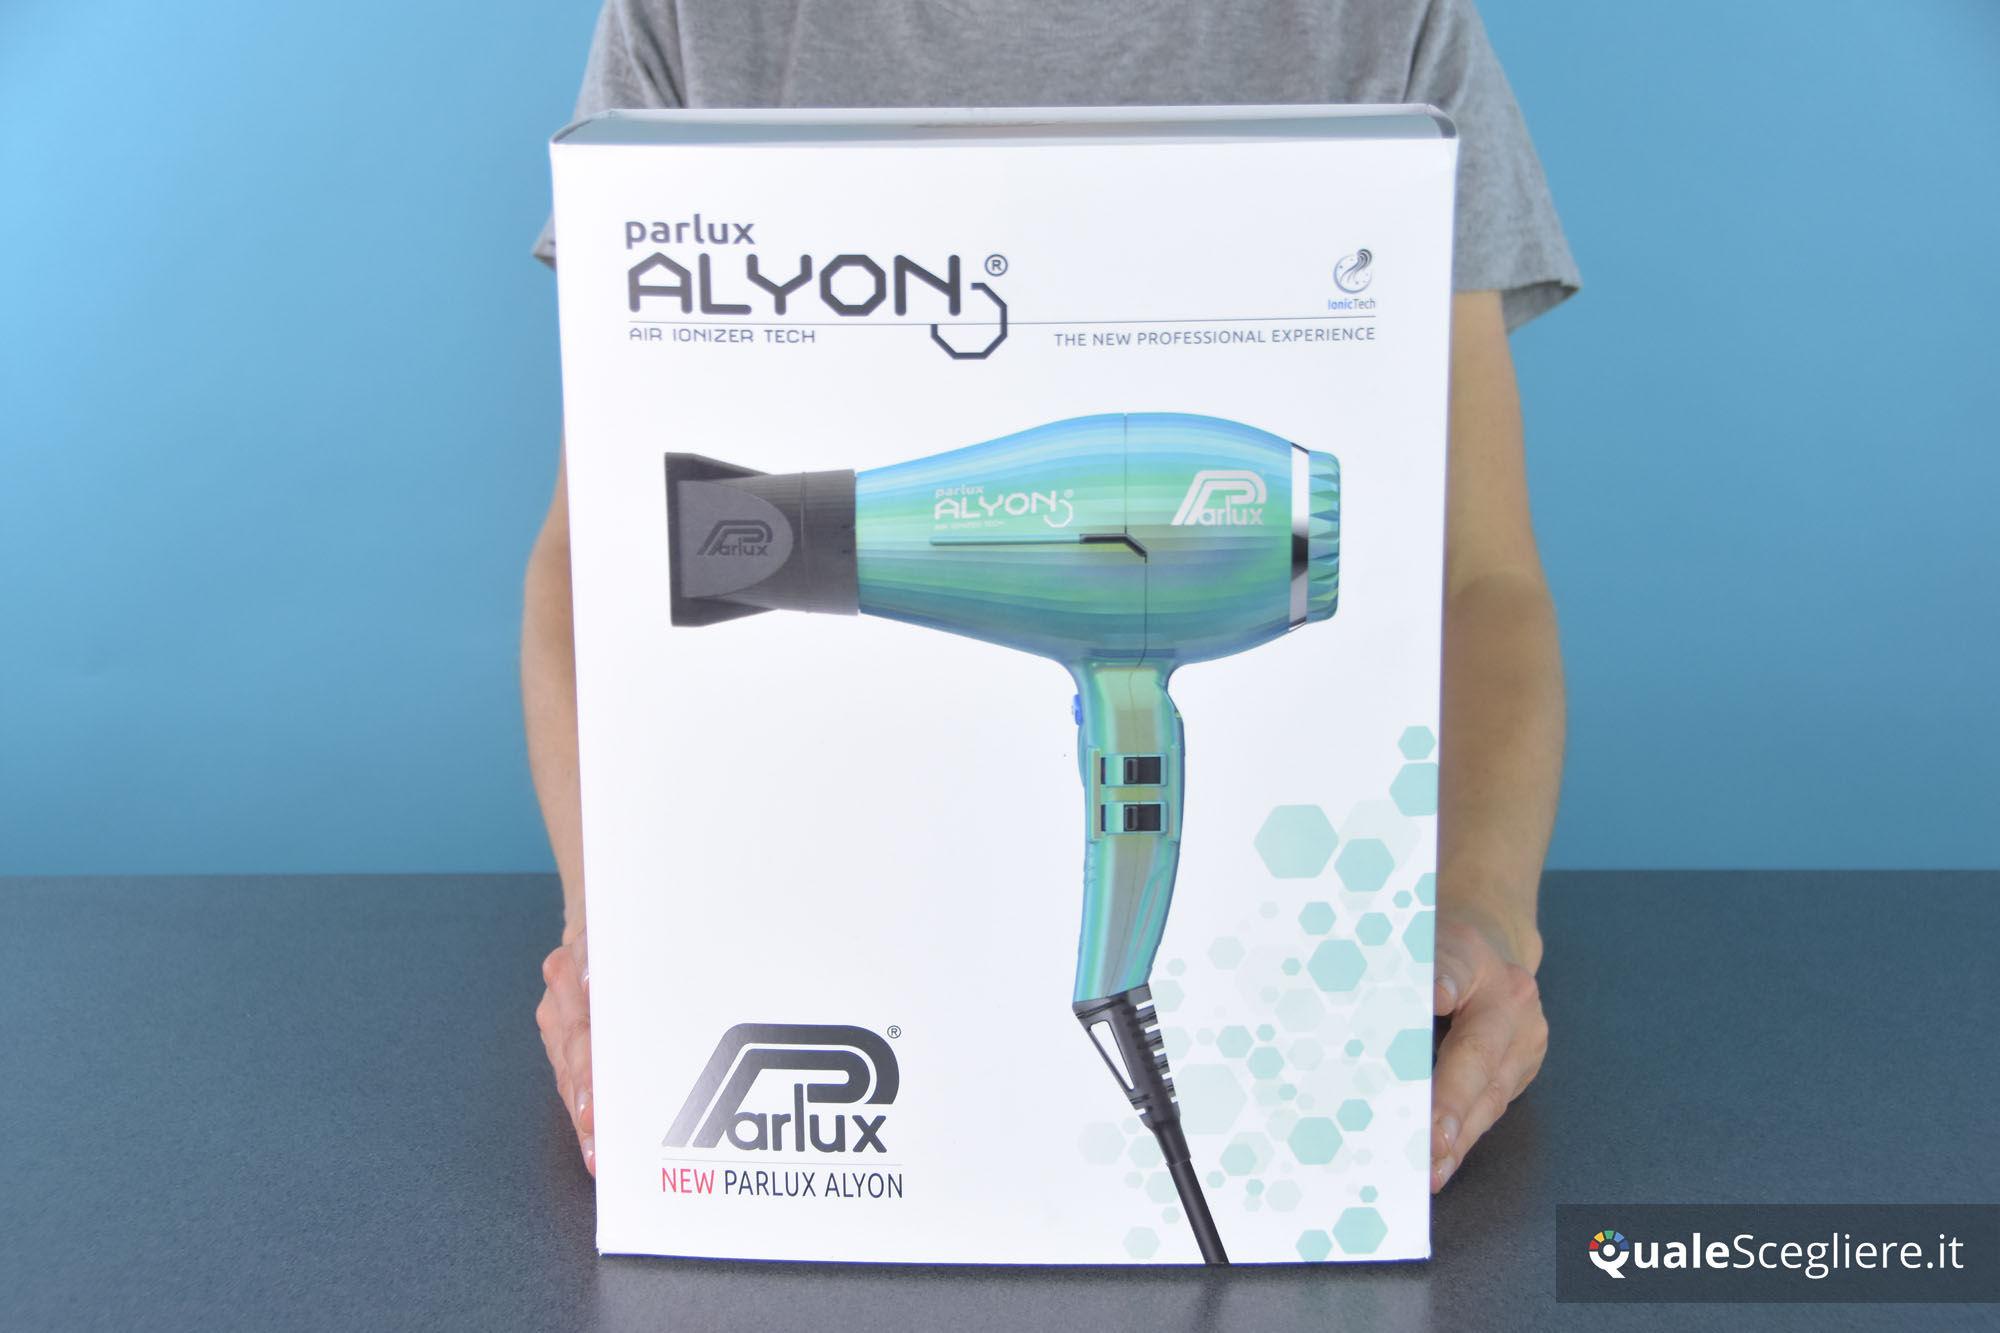 Parlux Alyon Air Ionizer Tech